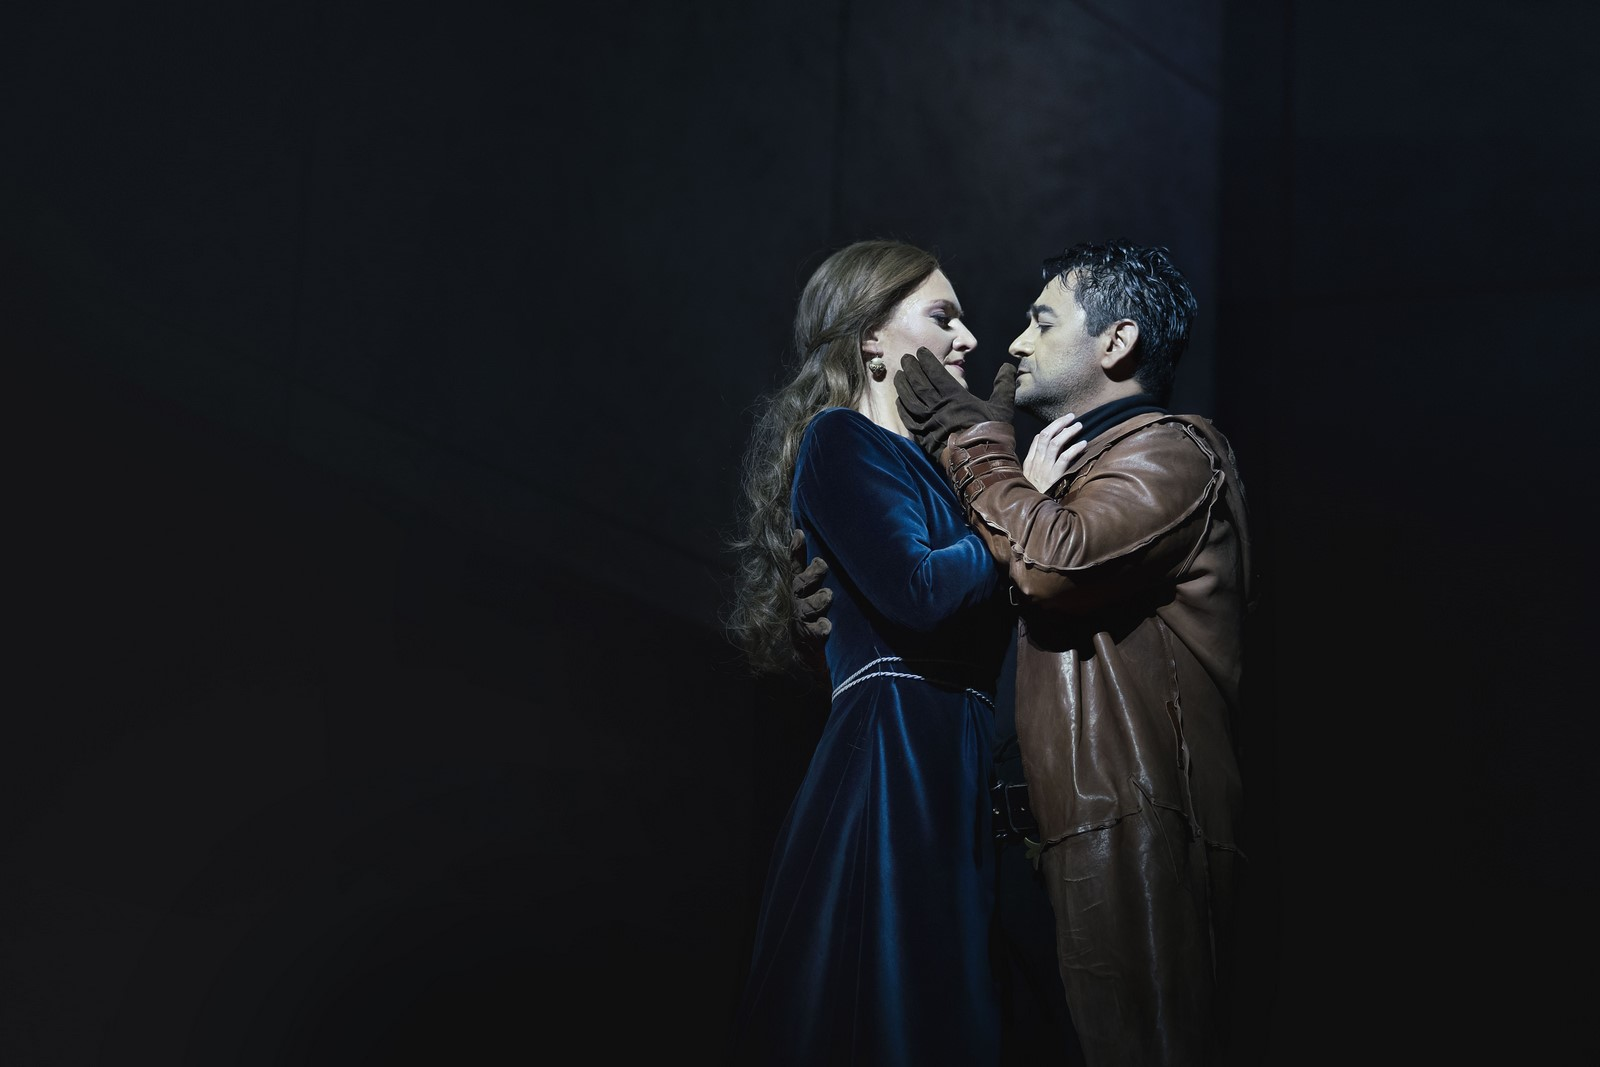 Anmeldelse: Trubaduren, Det Kongelige Teater (co-produktion med Teatro Real i Madrid og Opéra Monte Carlo)